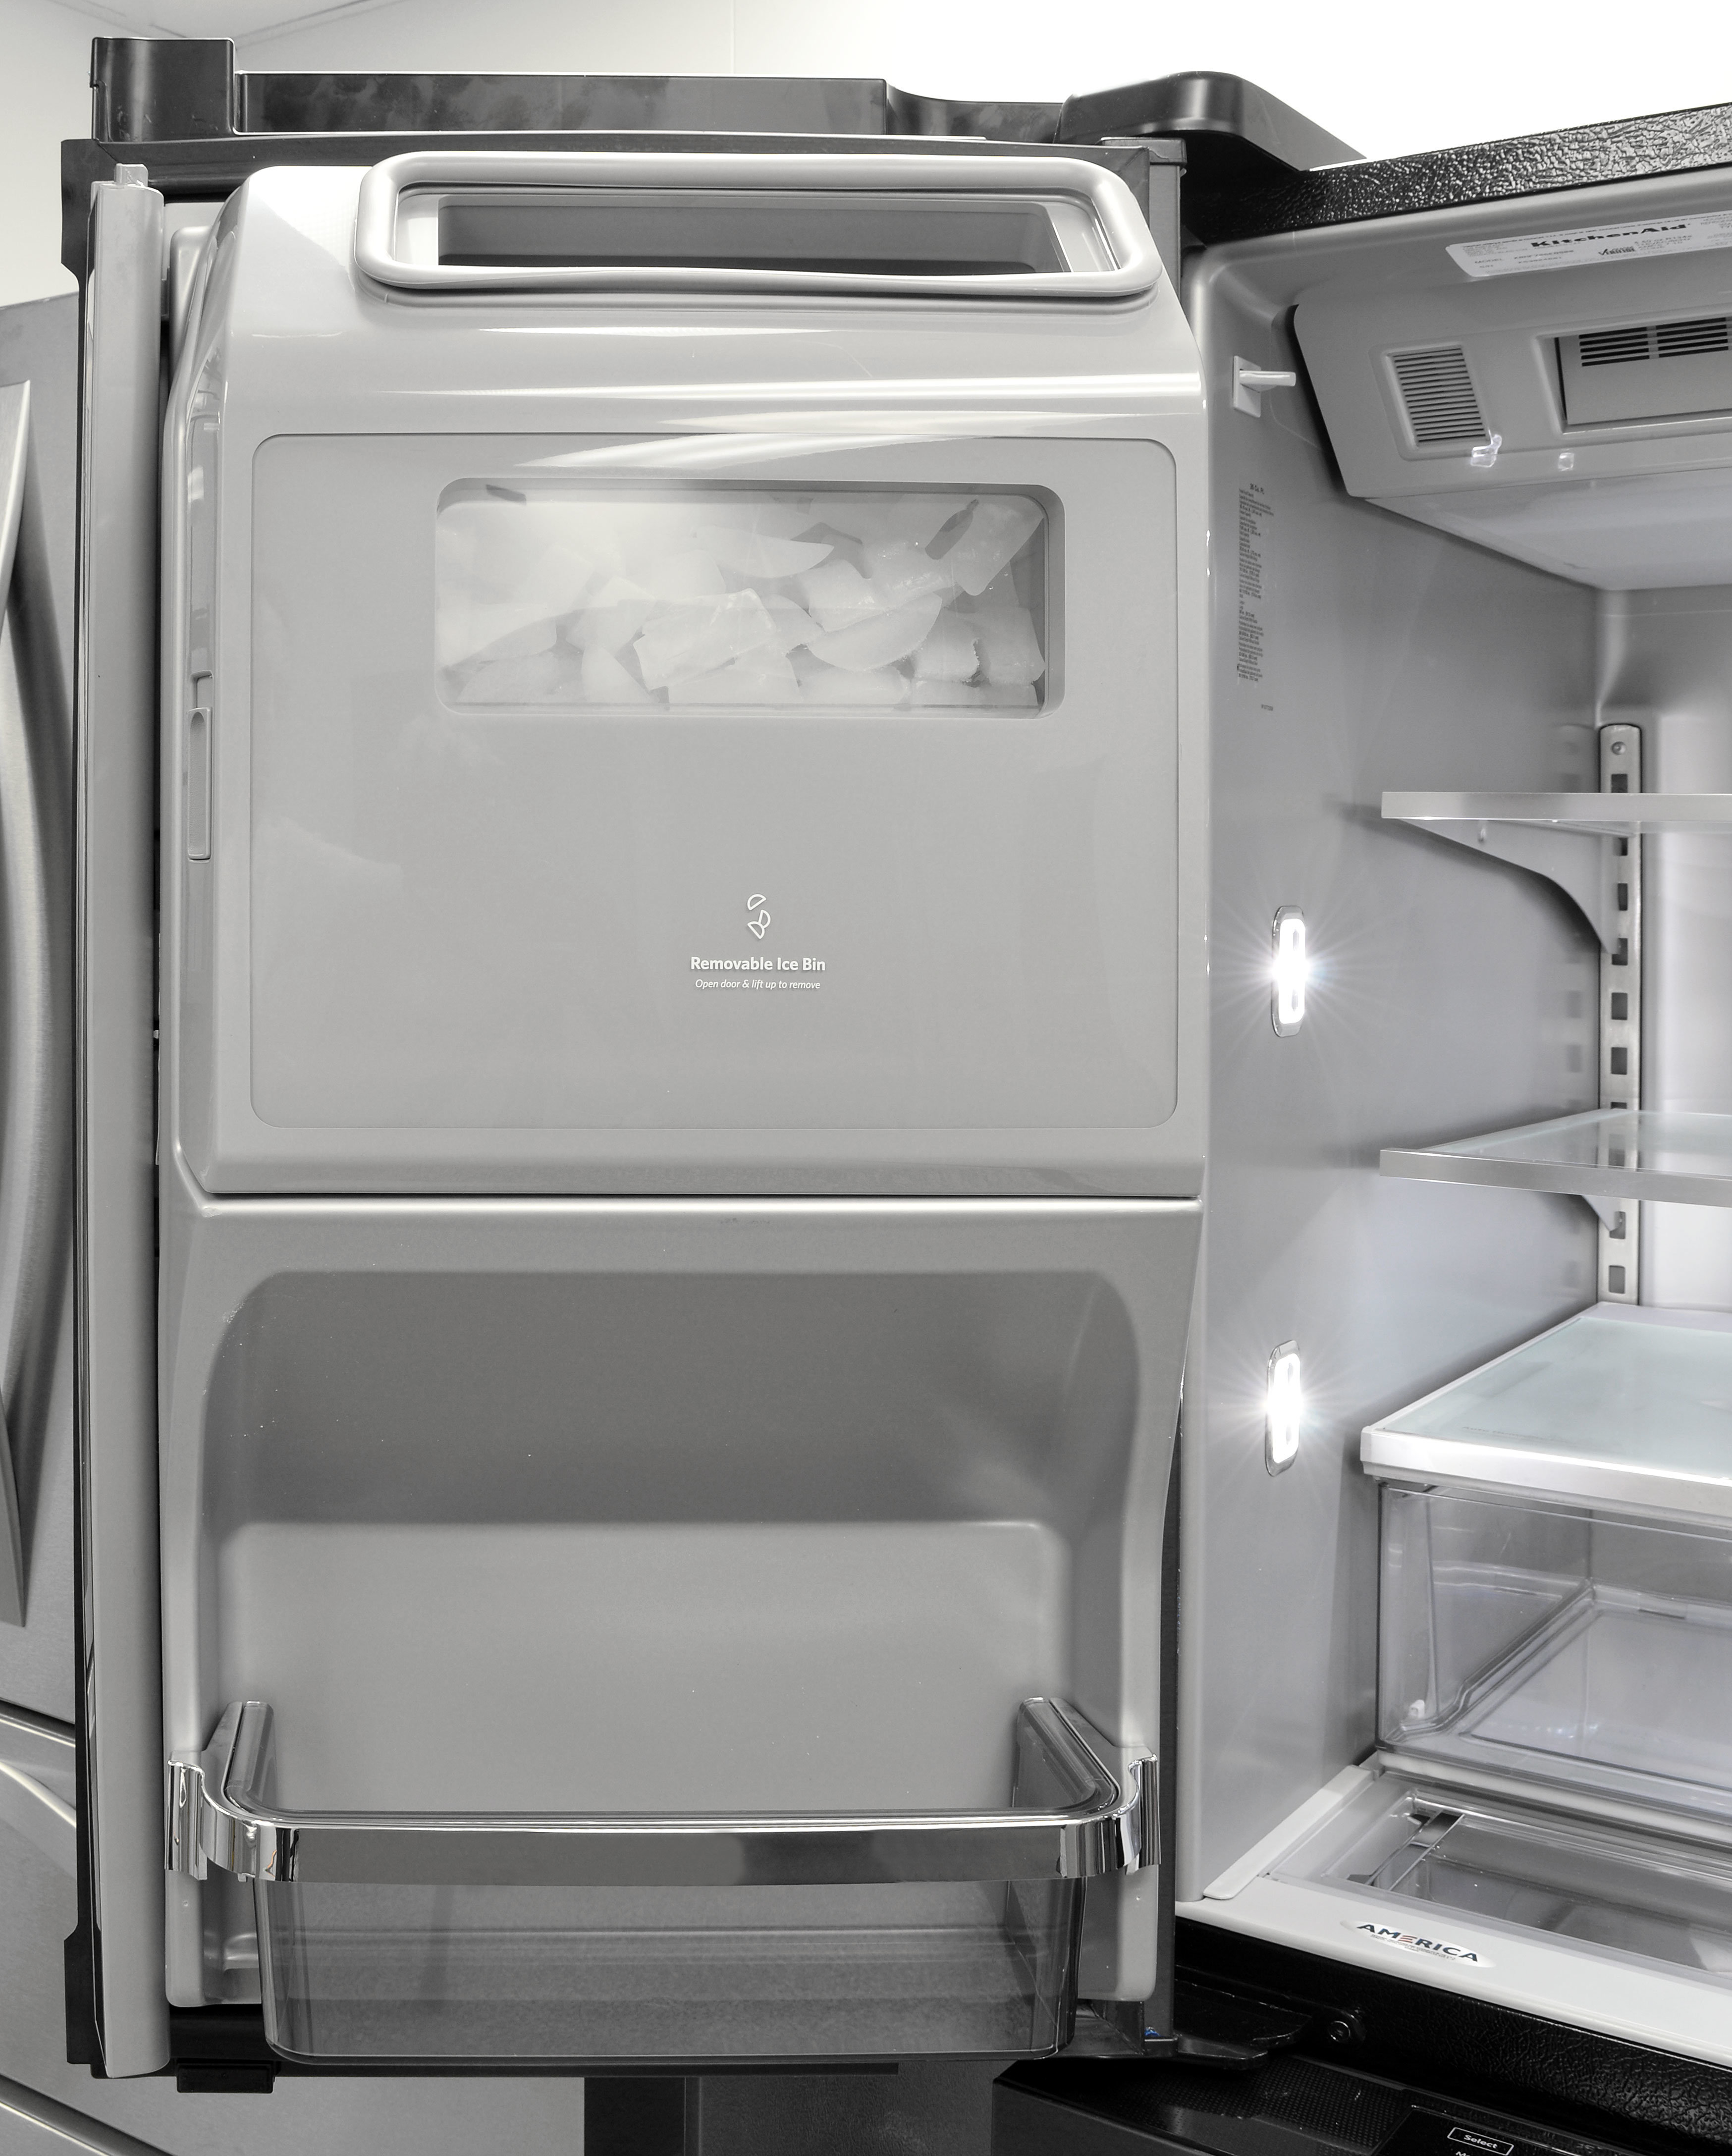 Kitchenaid Krmf706ebs Refrigerator Review Reviewed Com